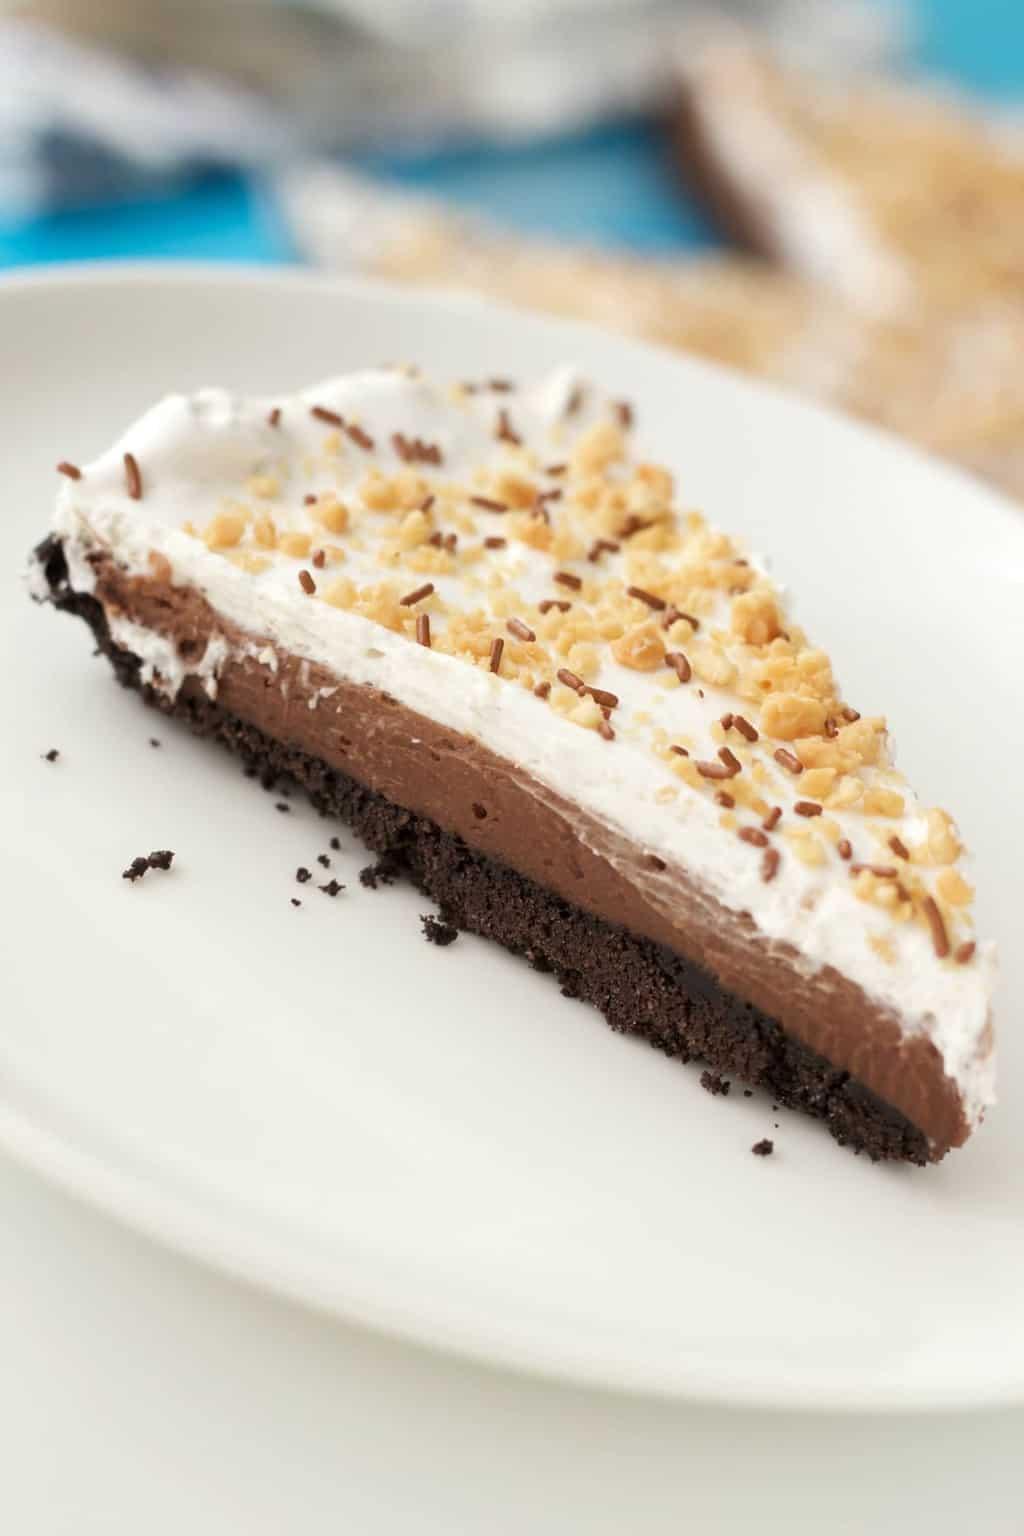 Vegan Chocolate Peanut Butter Oreo Pie #vegan #lovingitvegan #oreo #pie #dessert